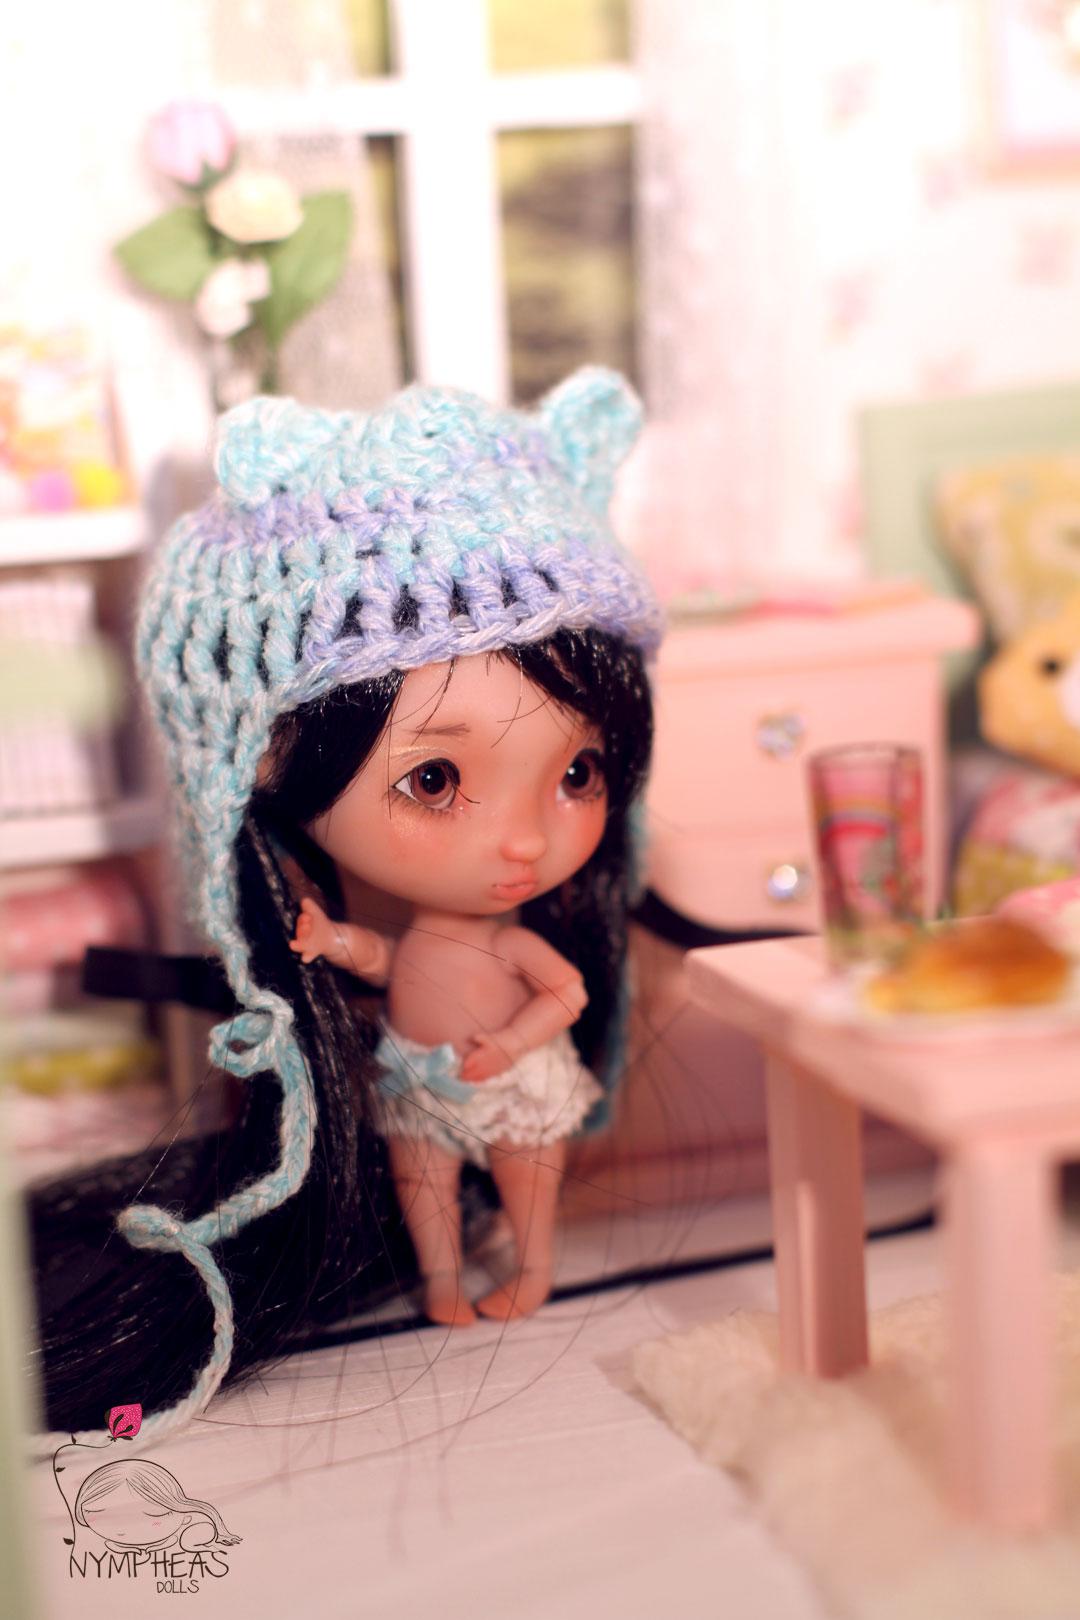 [Nympheas dolls] pinup choice & nouvelle demoiselle : Yali p5 00019163